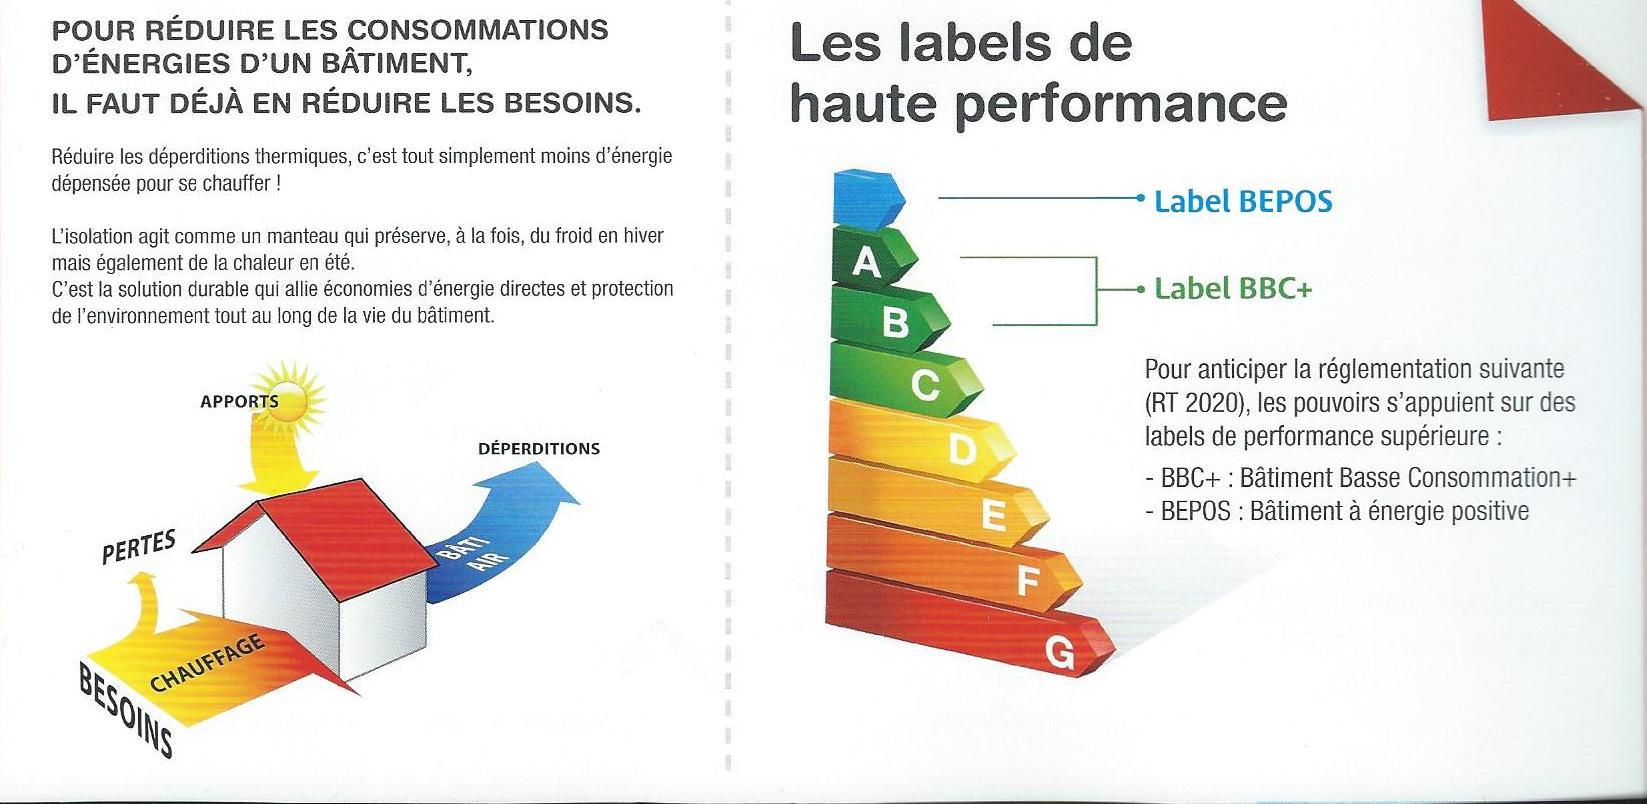 R glementation thermique rt 2012 tude thermique rt 2012 - Resistance thermique rt 2012 ...